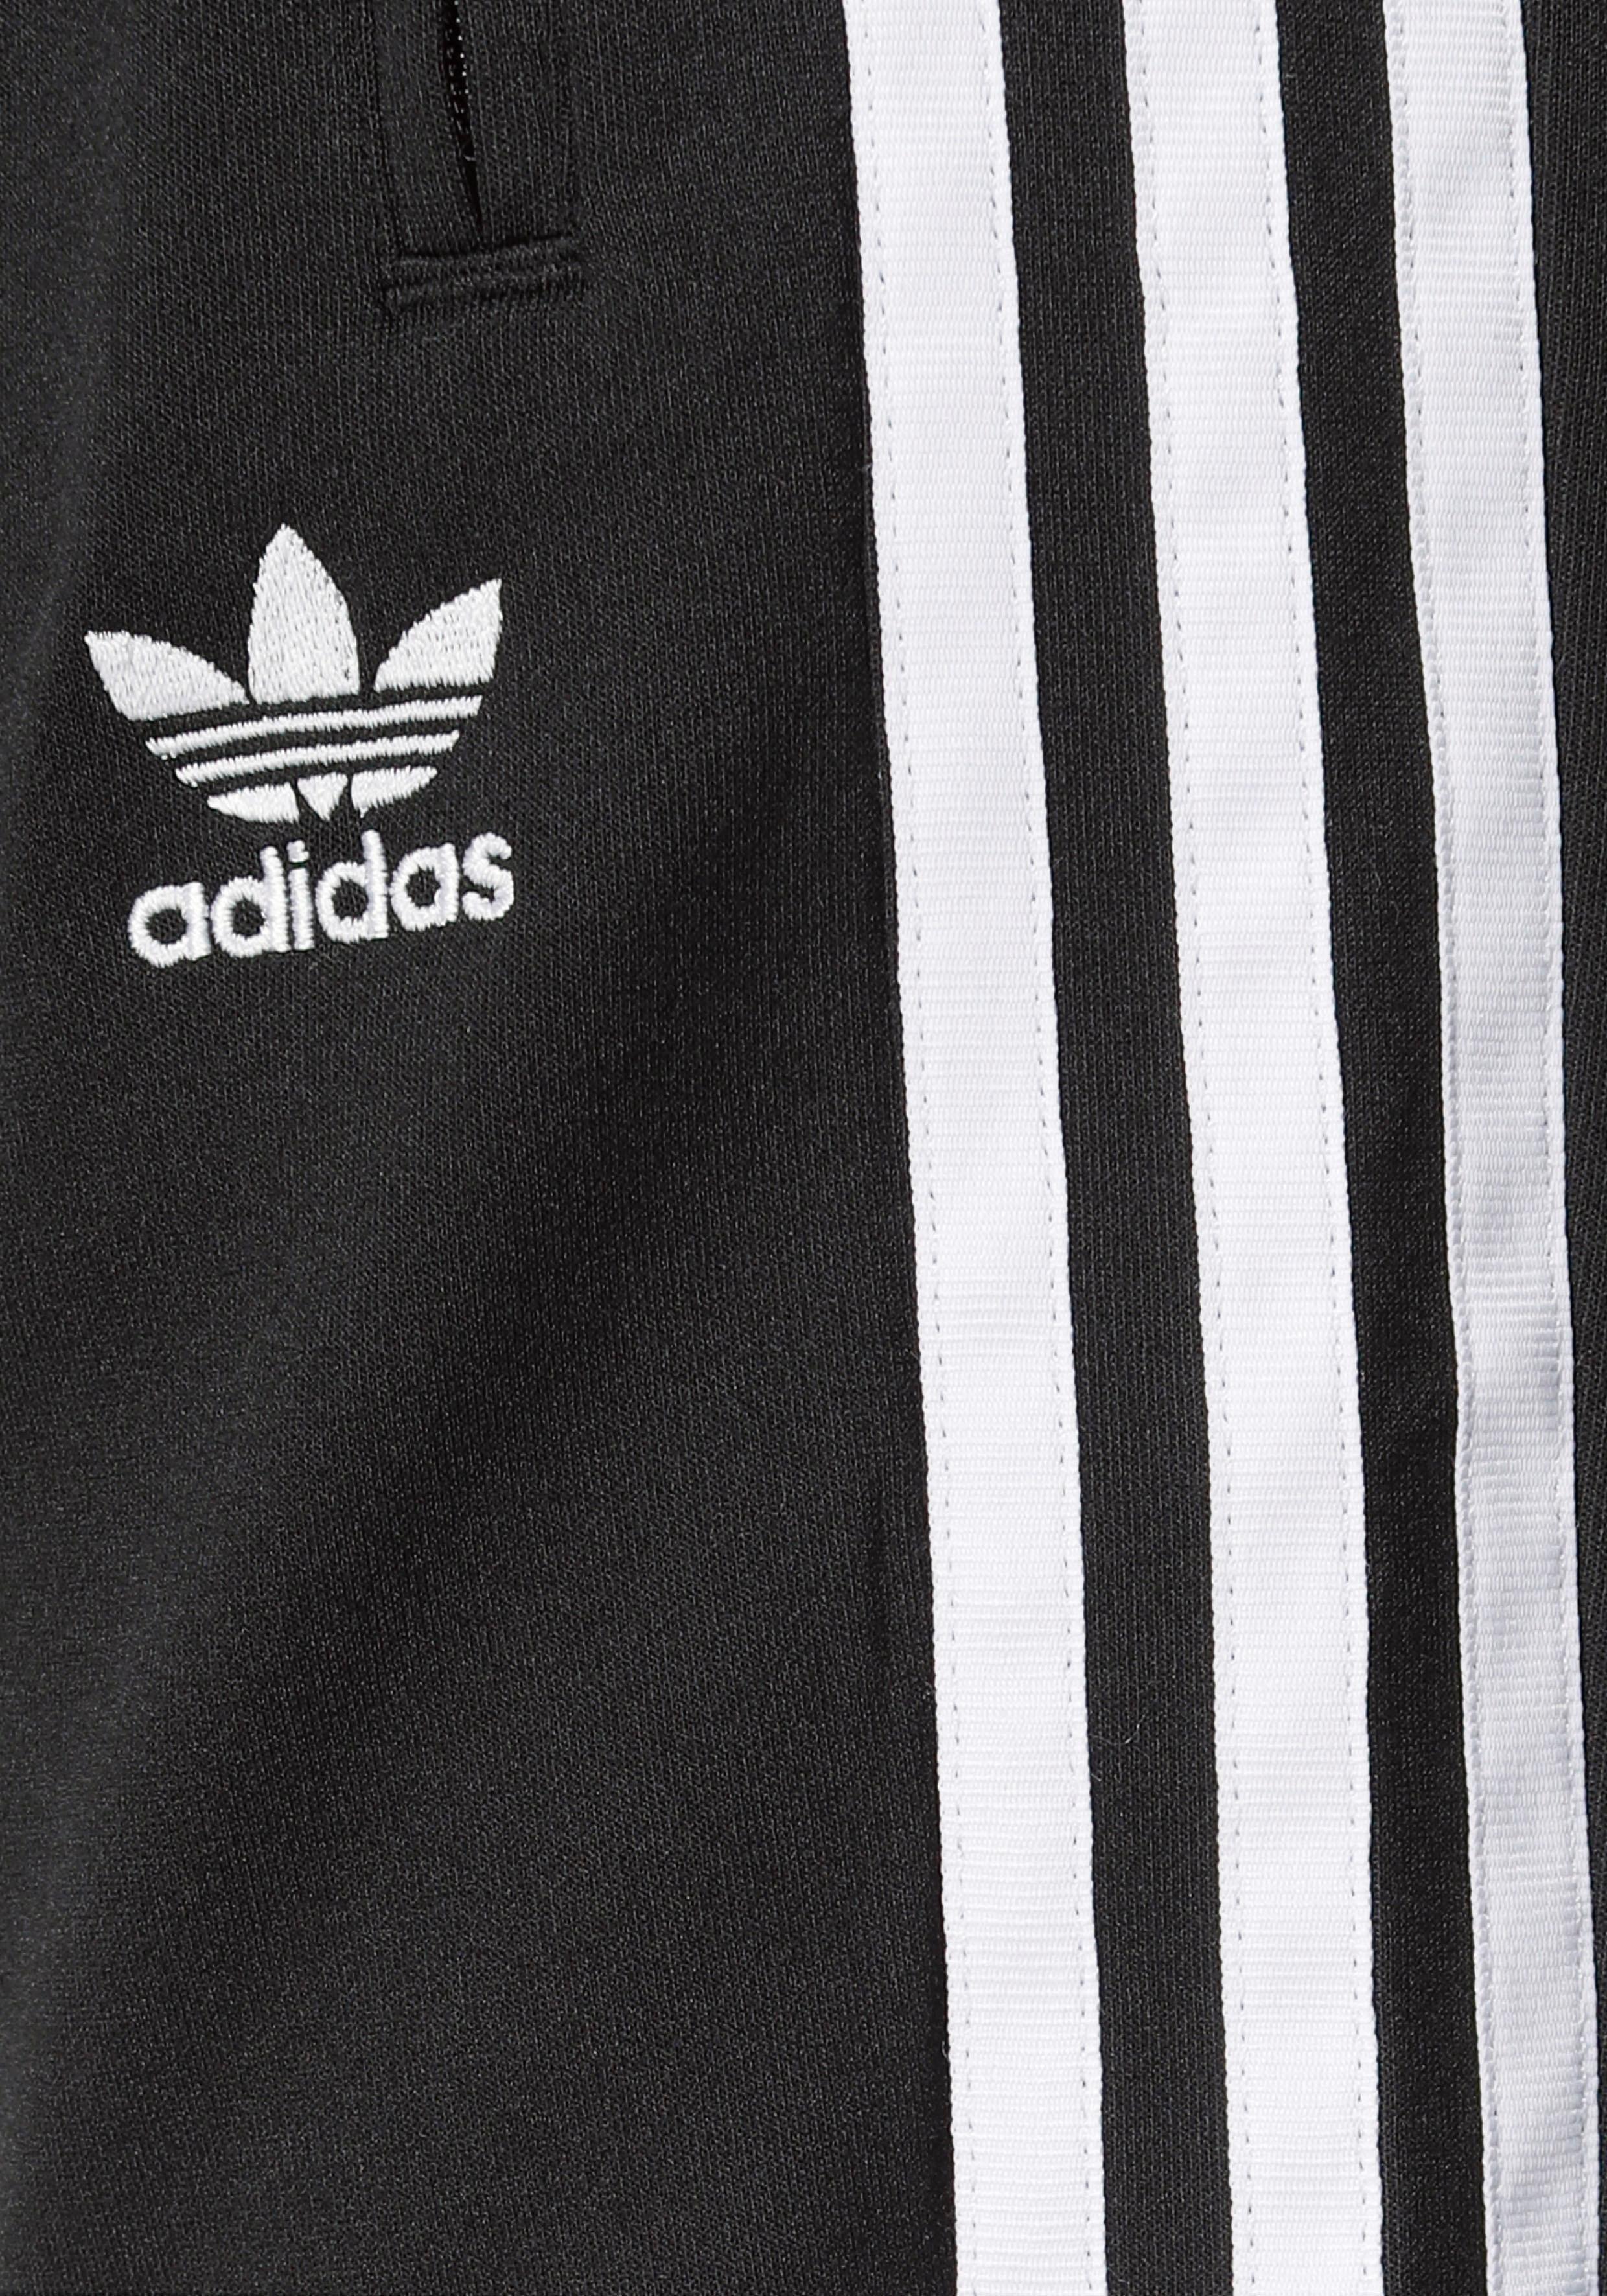 adidas Originals trainingsbroek »SST PANTS PB« nu online bestellen